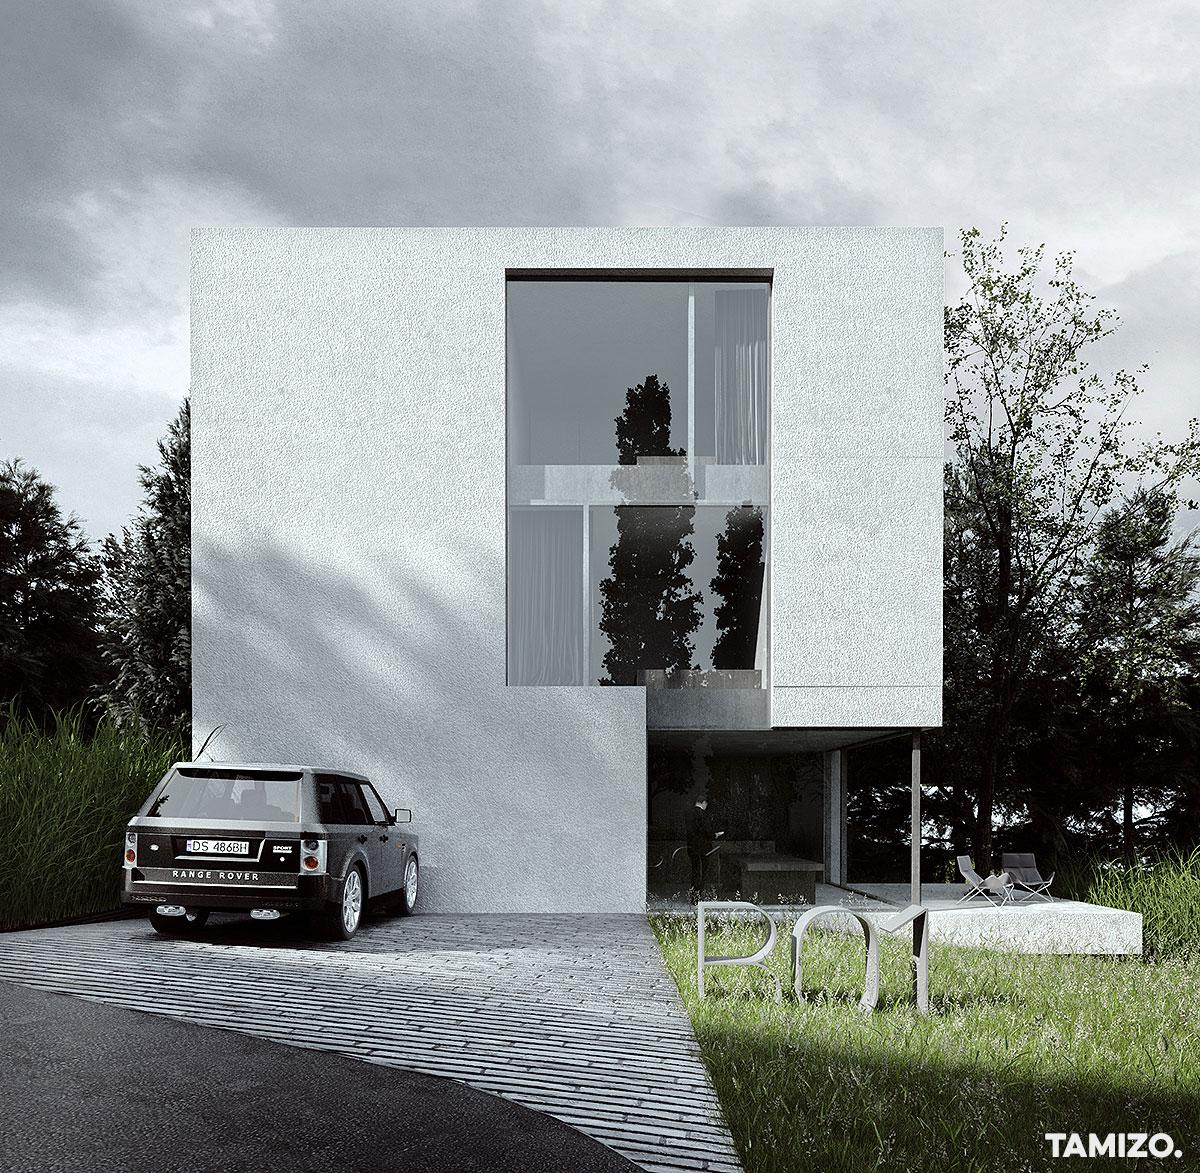 A061_tamizo_architects_competition_tbilisi_georgia_multifamily_houseing_realestate_08